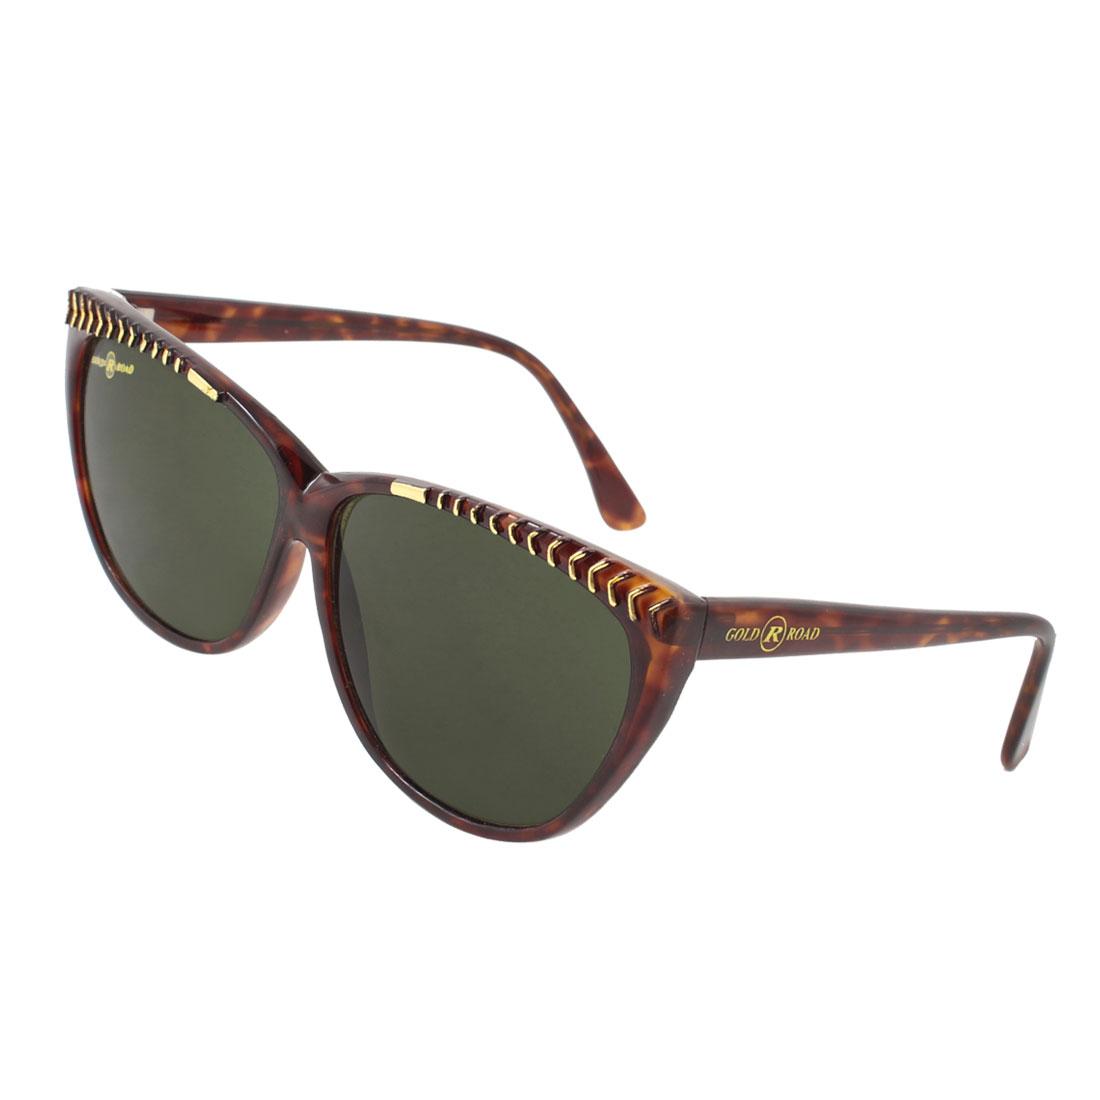 Oval Lens Dark Brown Leopard Pattern Full Frame Sunglasses for Woman